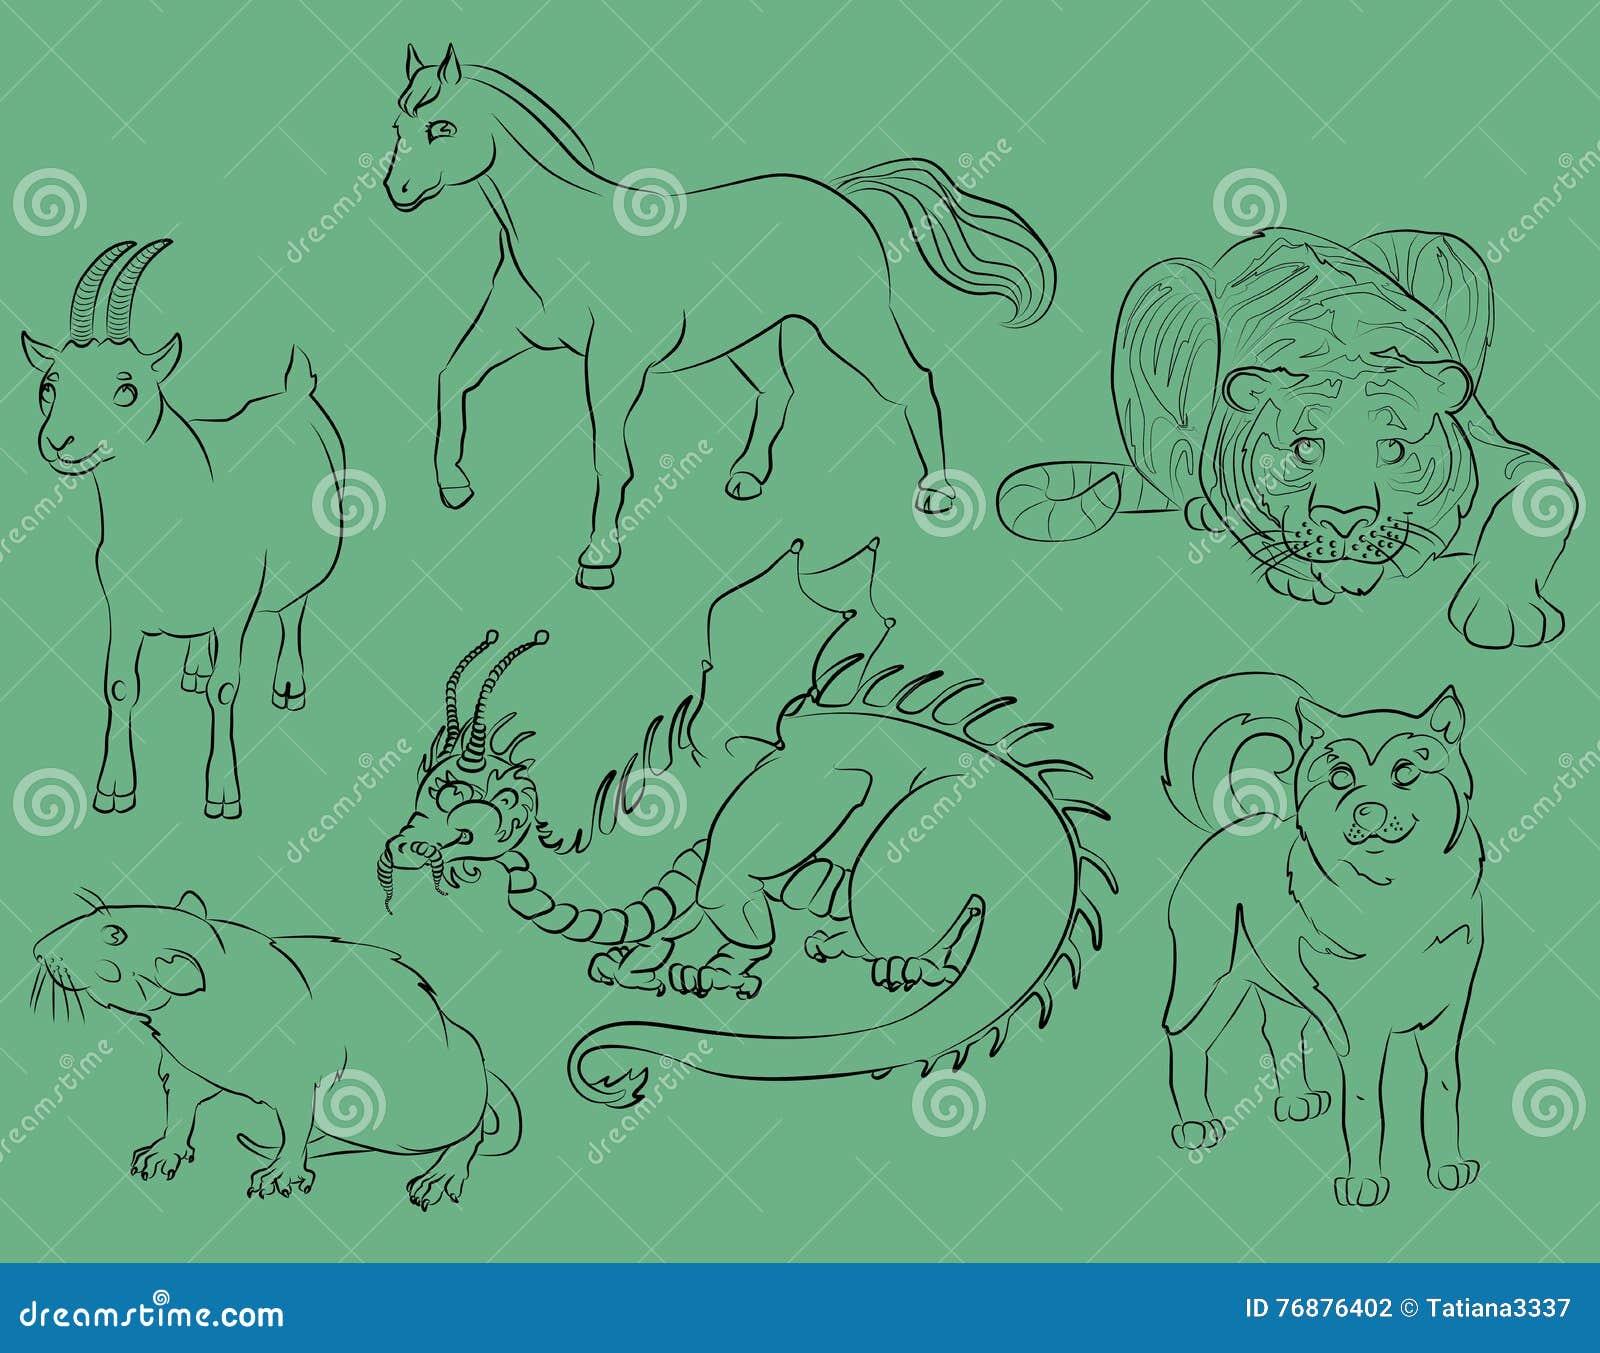 Dragon, Rat, Goat, Tiger, Horse And Dog Stock Vector